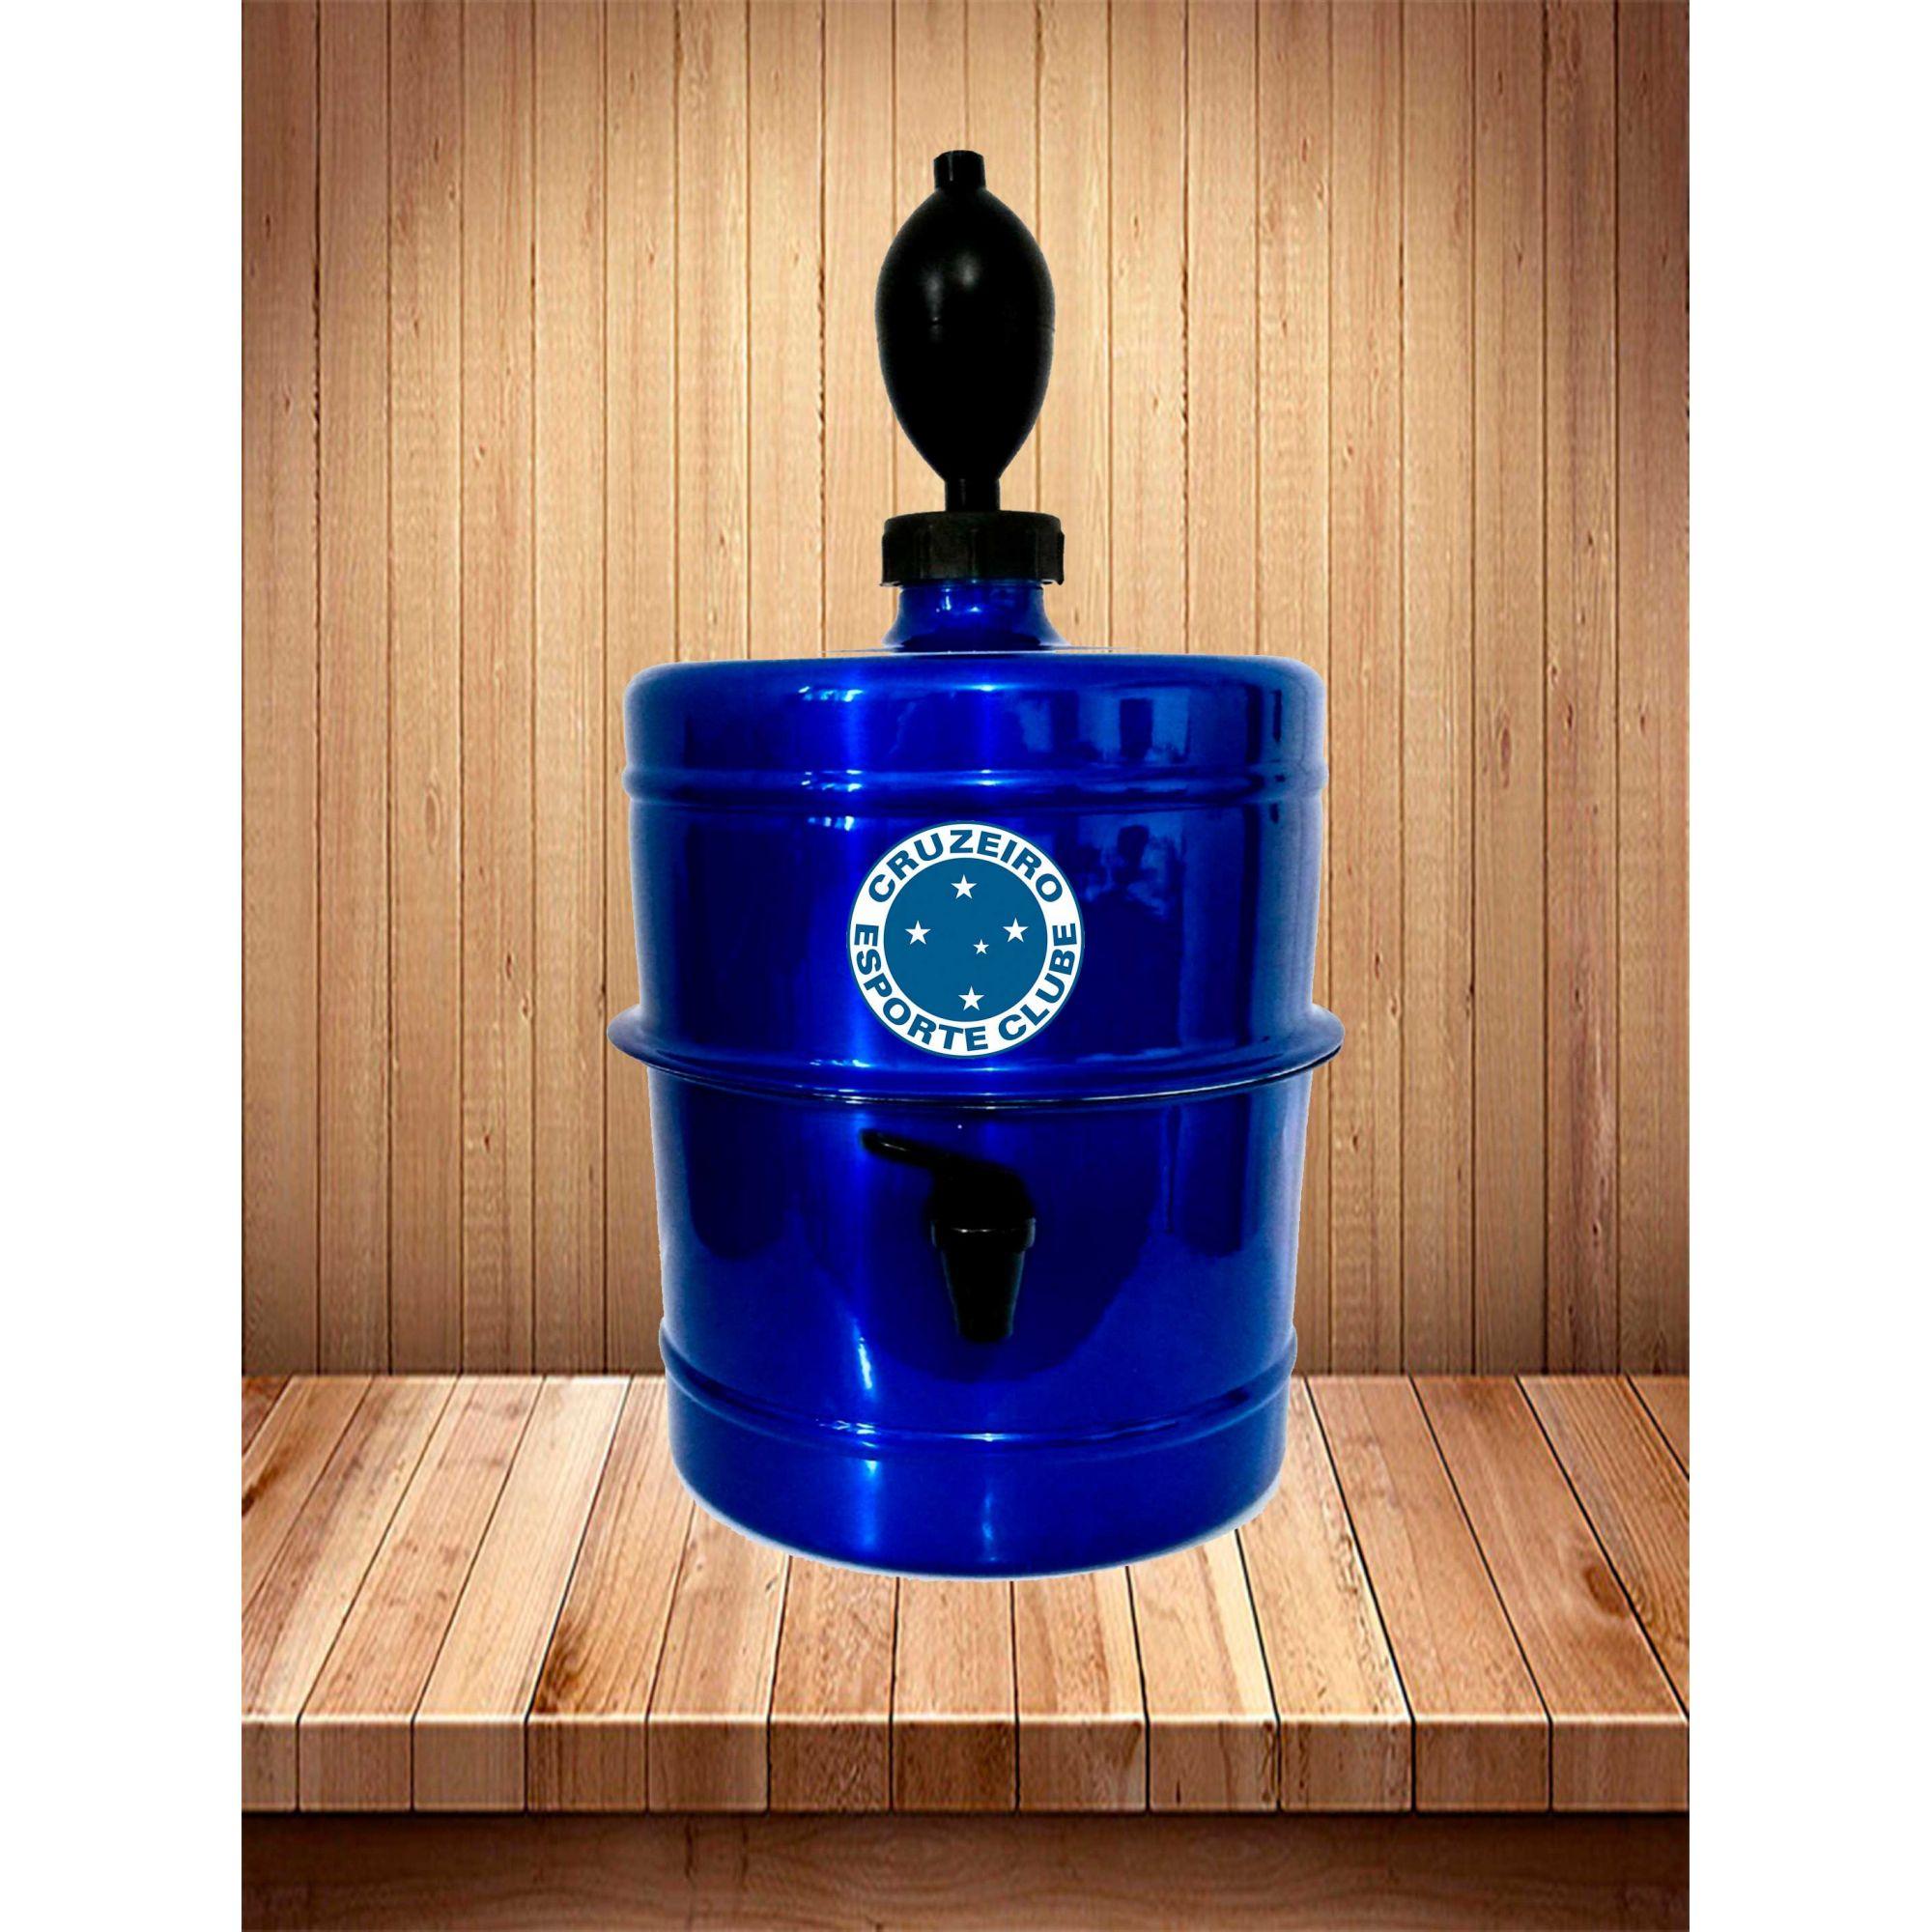 Chopeira Cruzeiro - Azul - Portátil 5,1 L